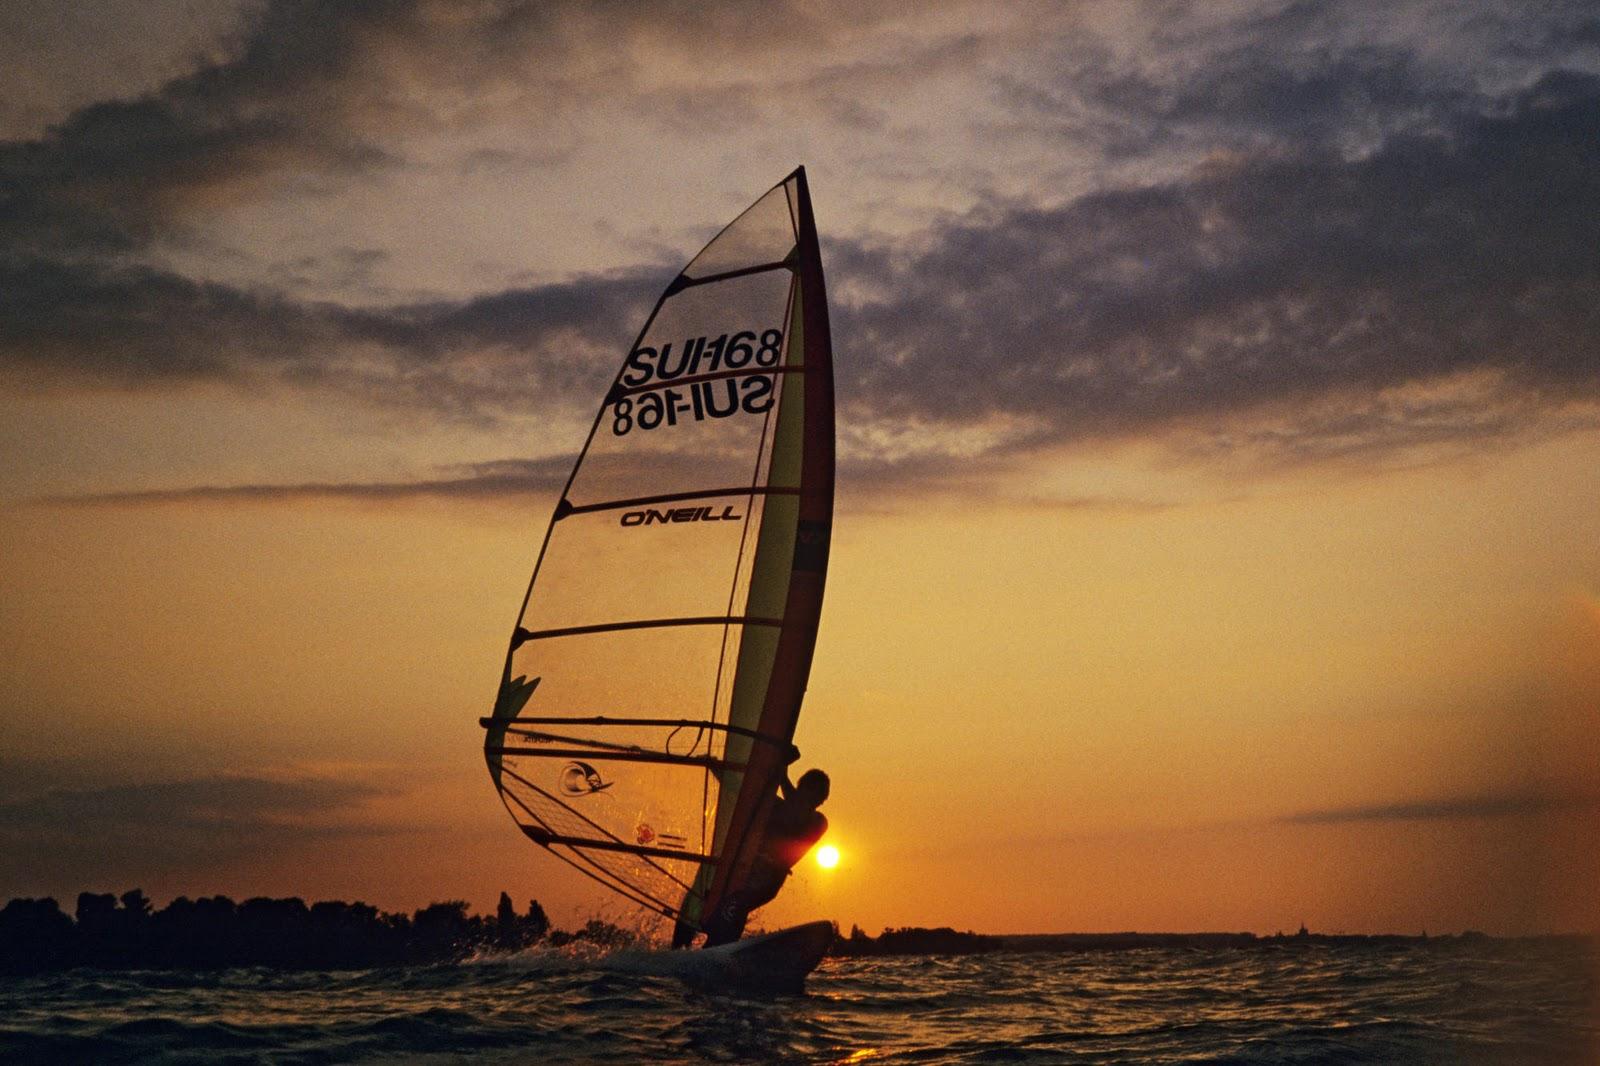 http://3.bp.blogspot.com/-4fRB6lzdeAA/Tsso11ptU1I/AAAAAAAAANc/mlTTRzqFr6I/s1600/windsurfing-switzerland-wallpaper-tab.jpg